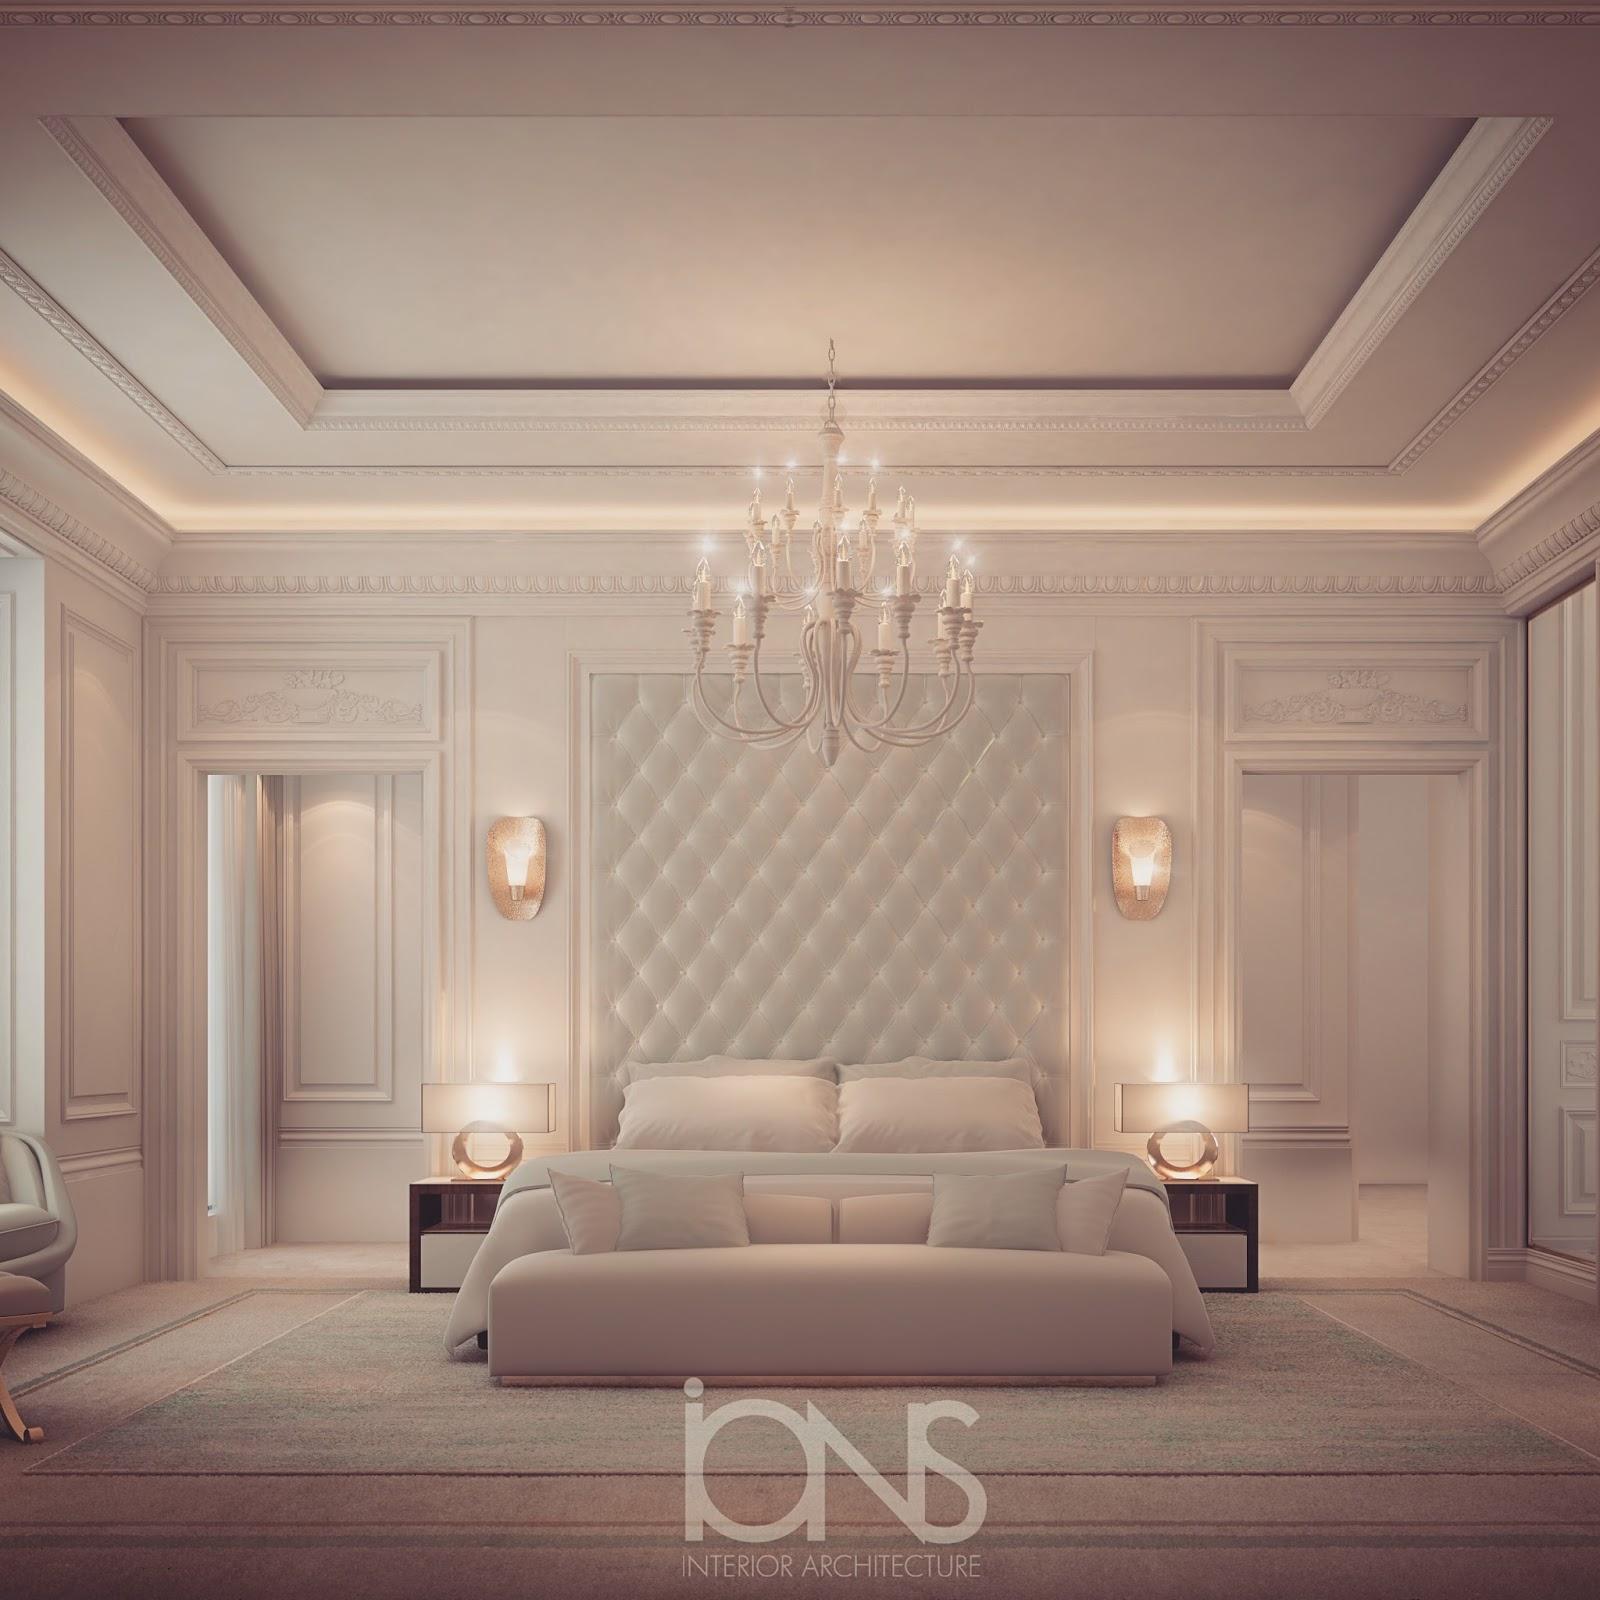 Dubai interior design company interior design ideas for for Bedroom designs dubai